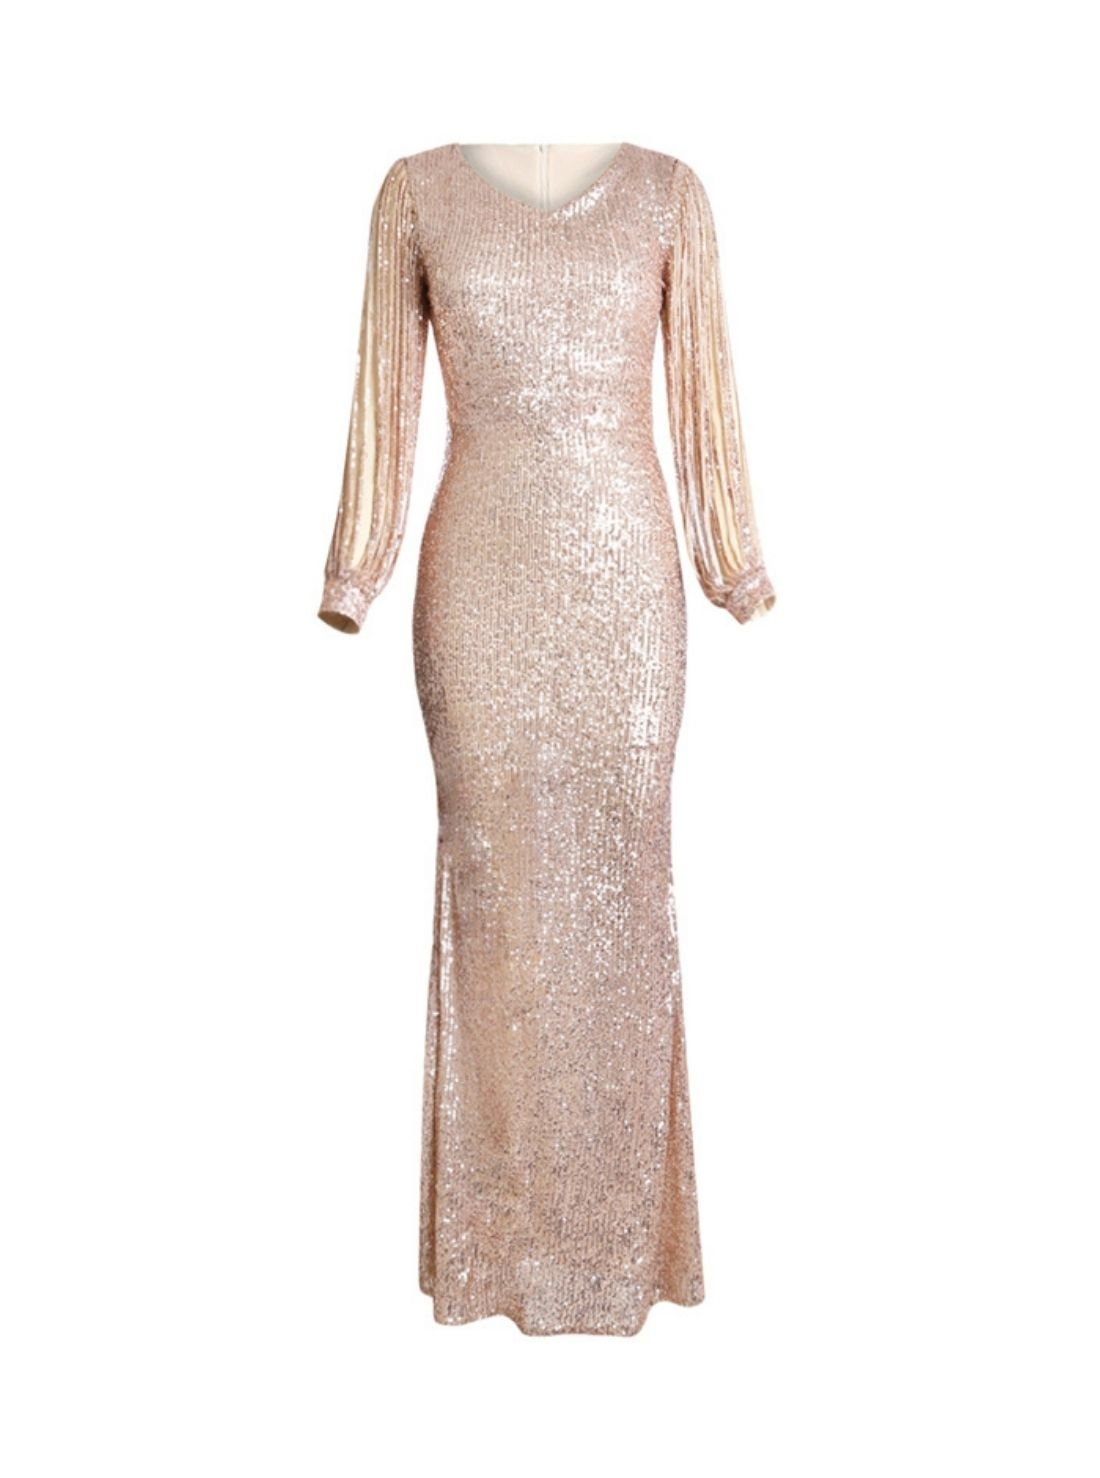 Wholesale Maxi Sequin Evening Dress